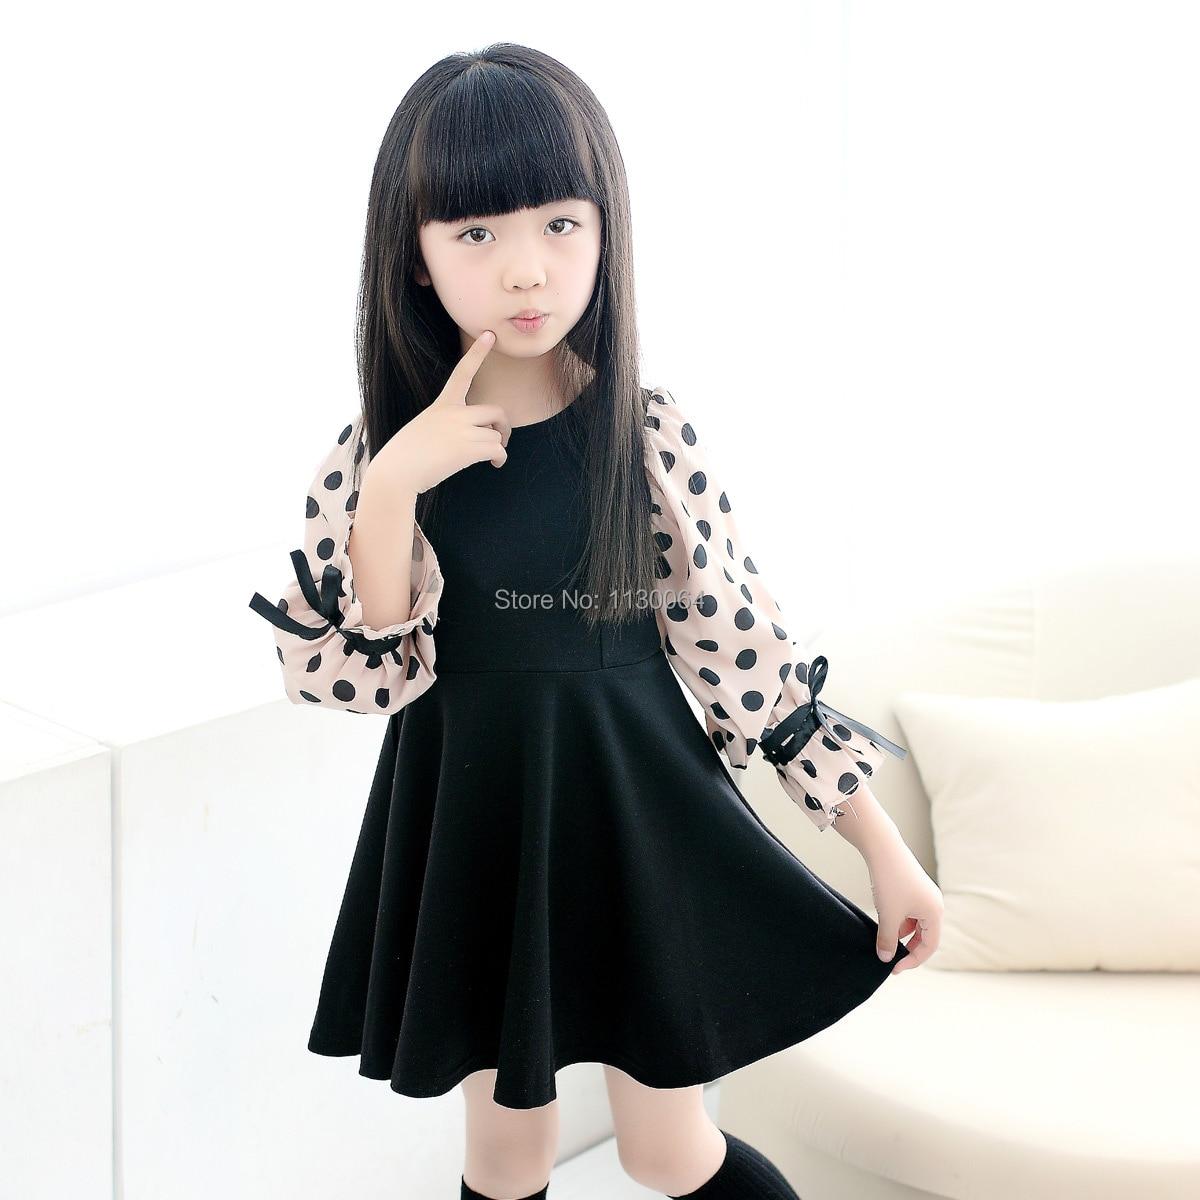 2015 New Summer Fashion Black Chiffon Polka Dot Long Sleeved Girl Dress 100 Cotton Children